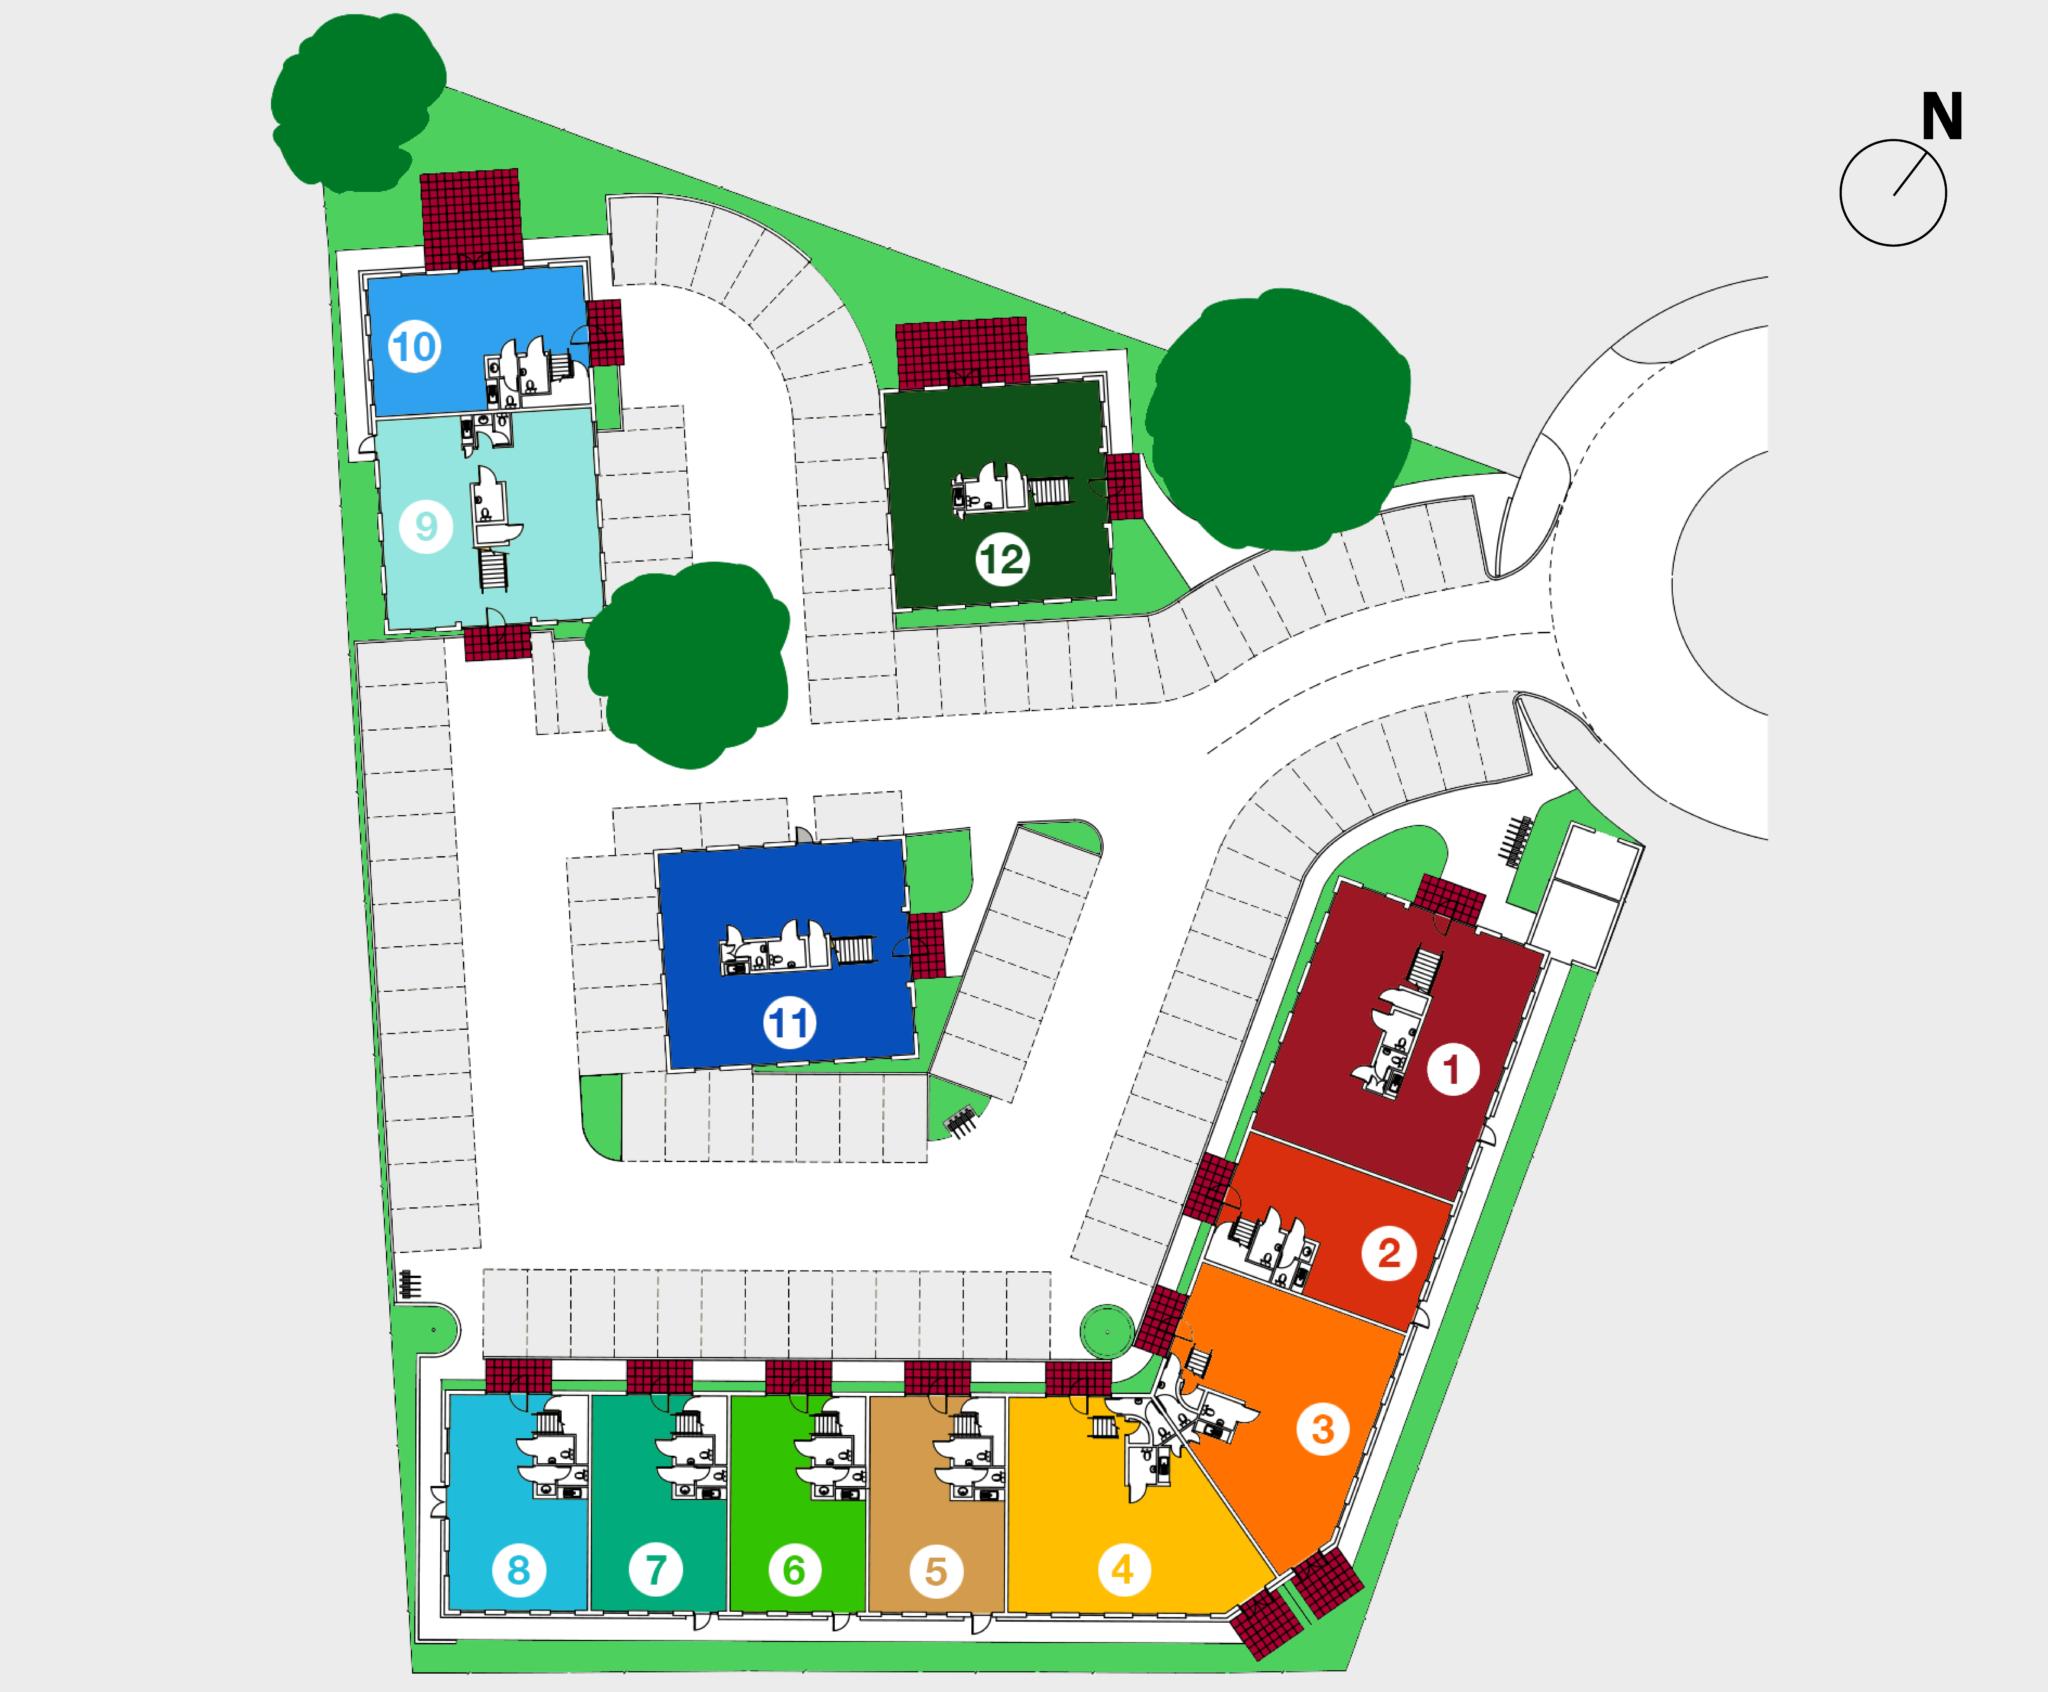 The Courtyard plan